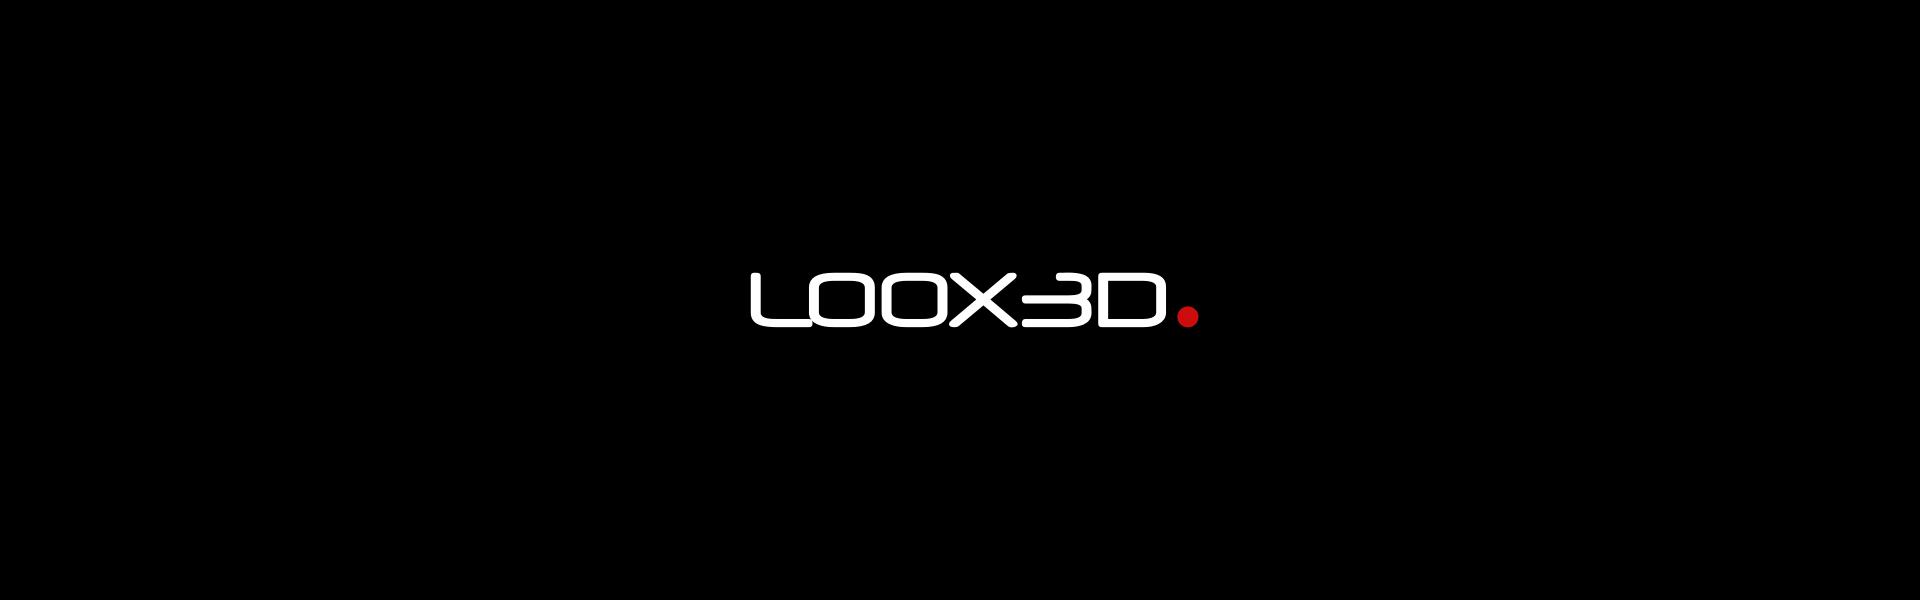 LOOX3D SET2